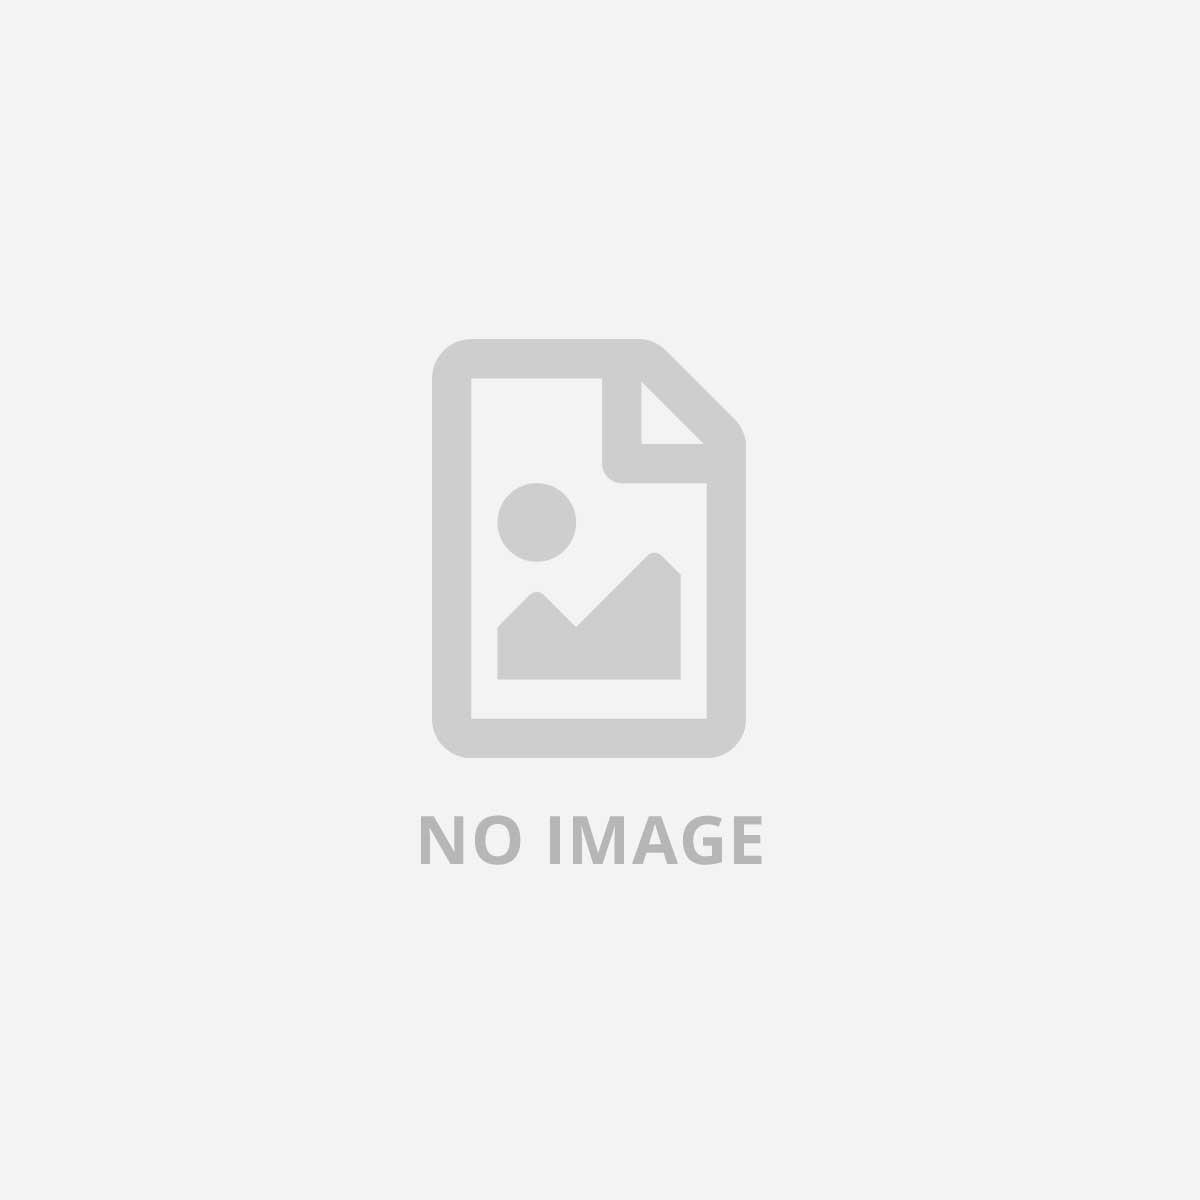 SONY DSC W810 20MP BLACK